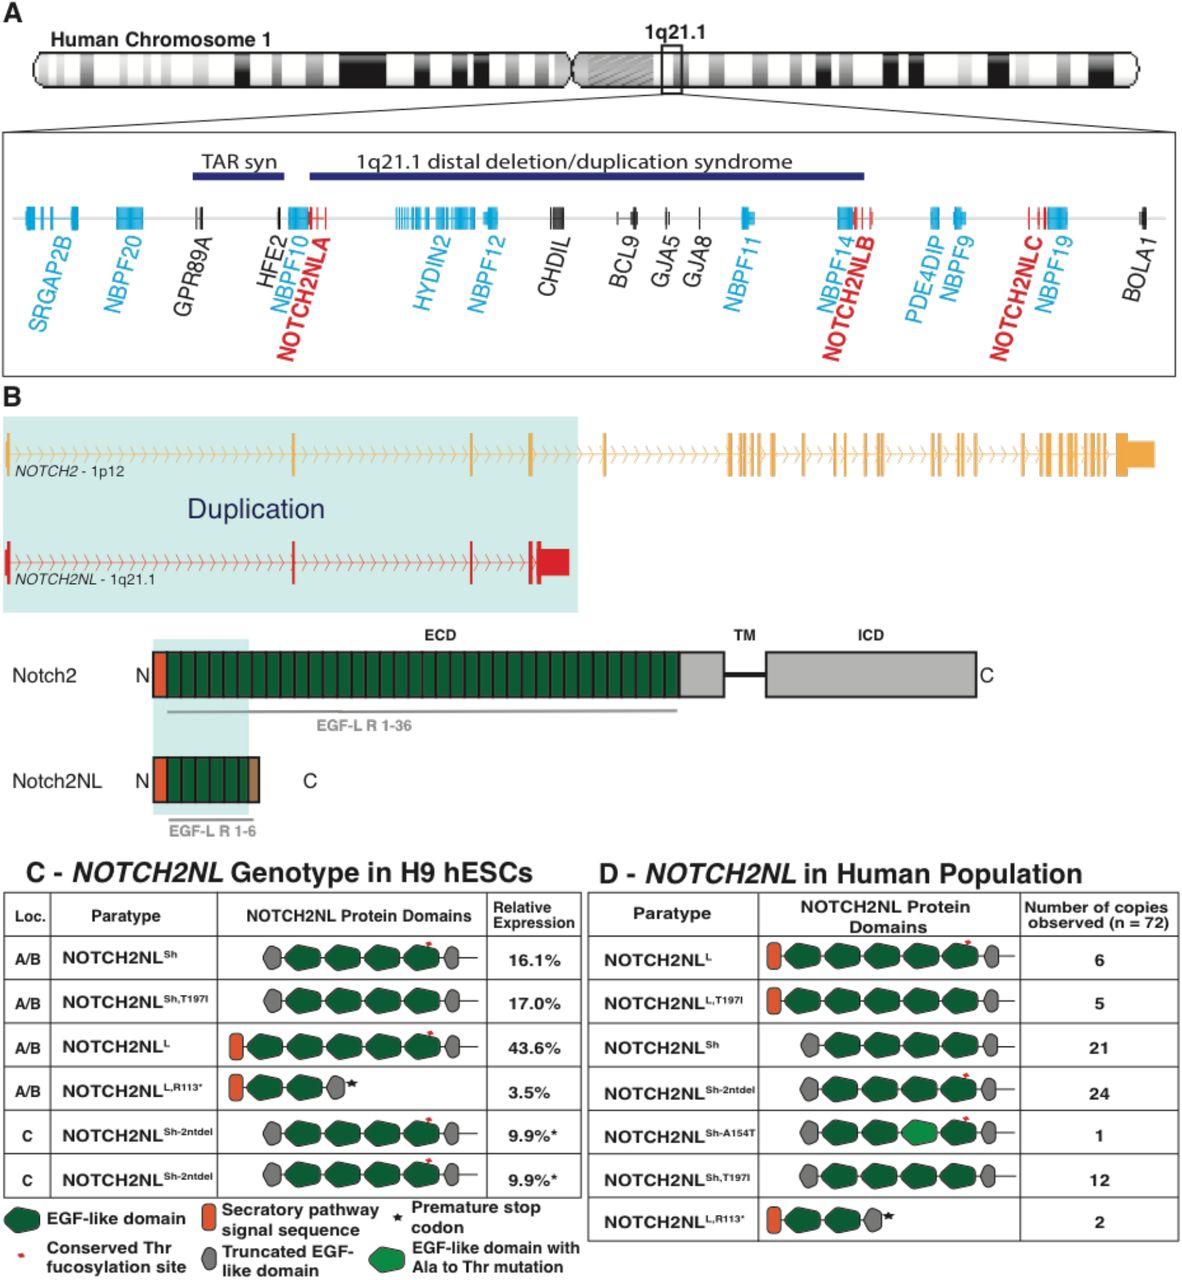 Human-specific NOTCH-like genes in a region linked to